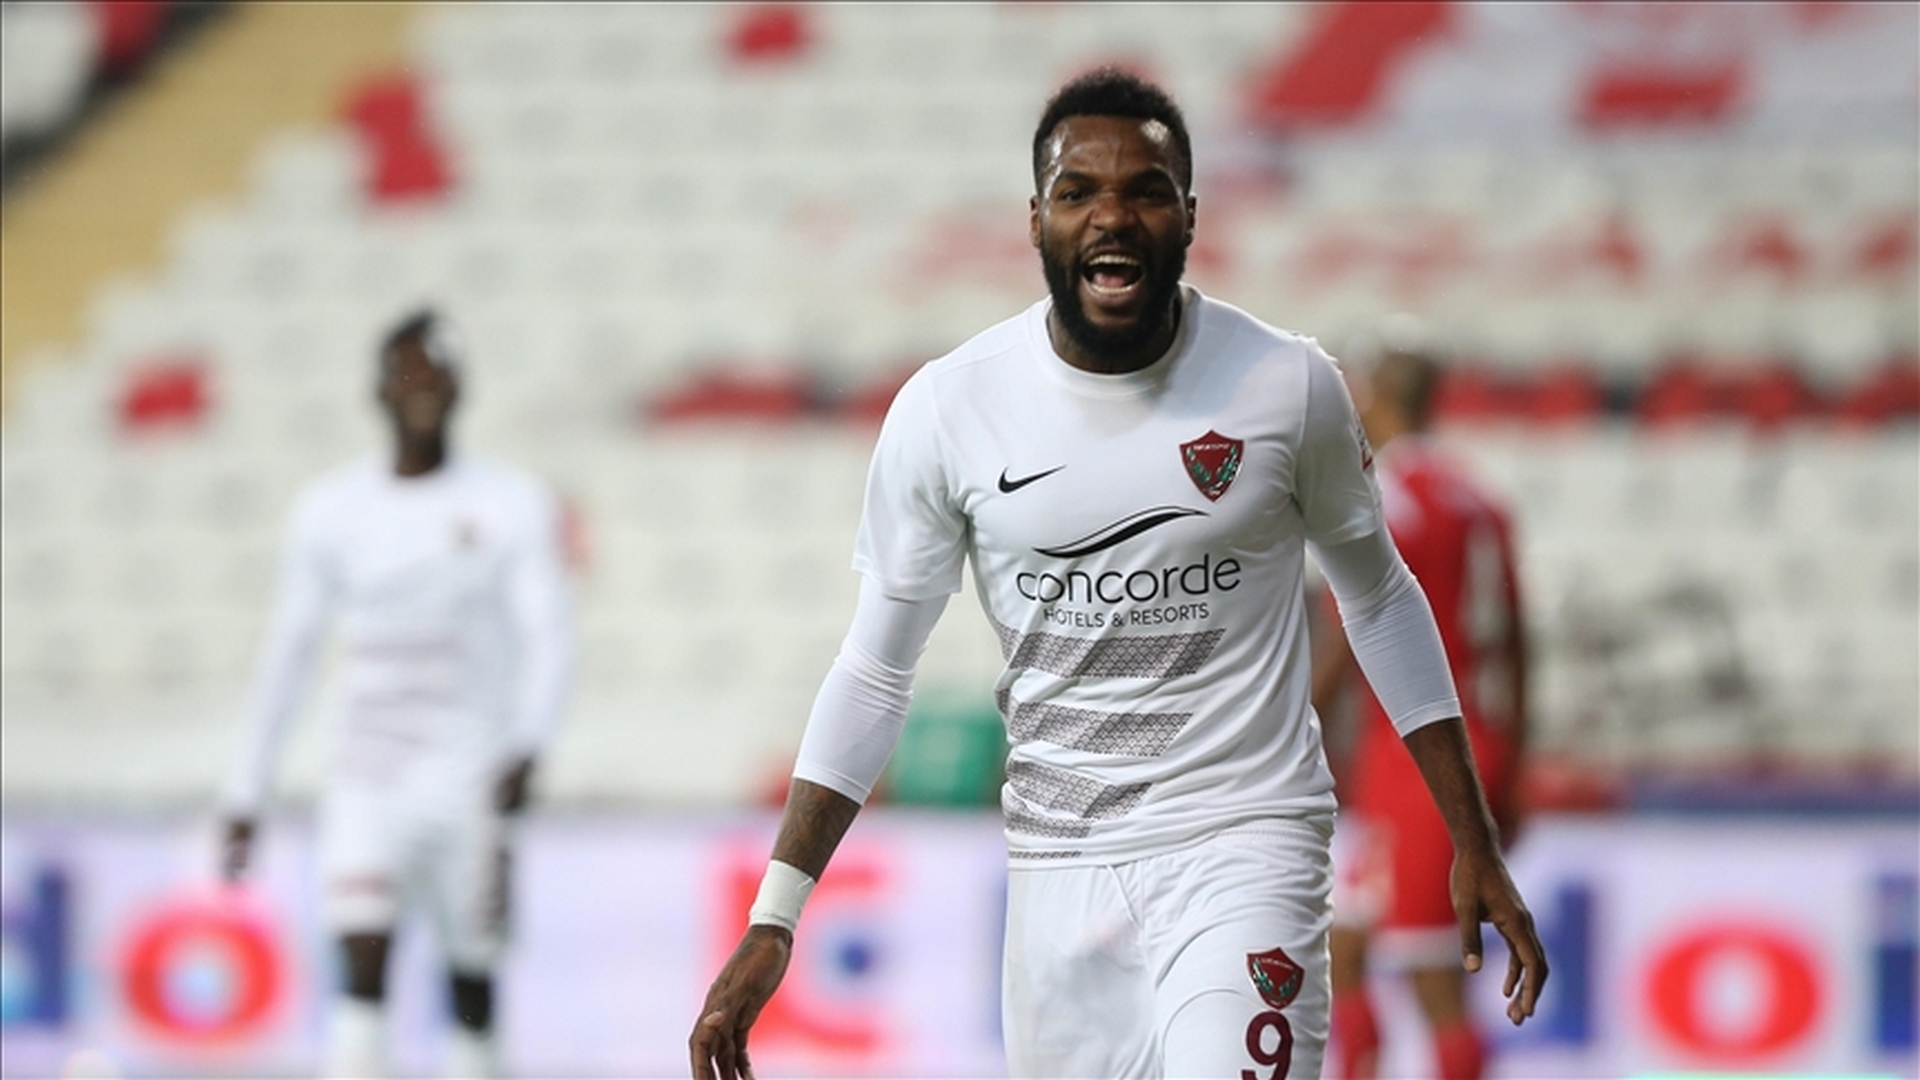 Boupendza scores, Munir sees red in Hatayspor's loss to Sio's Genclerbirligi